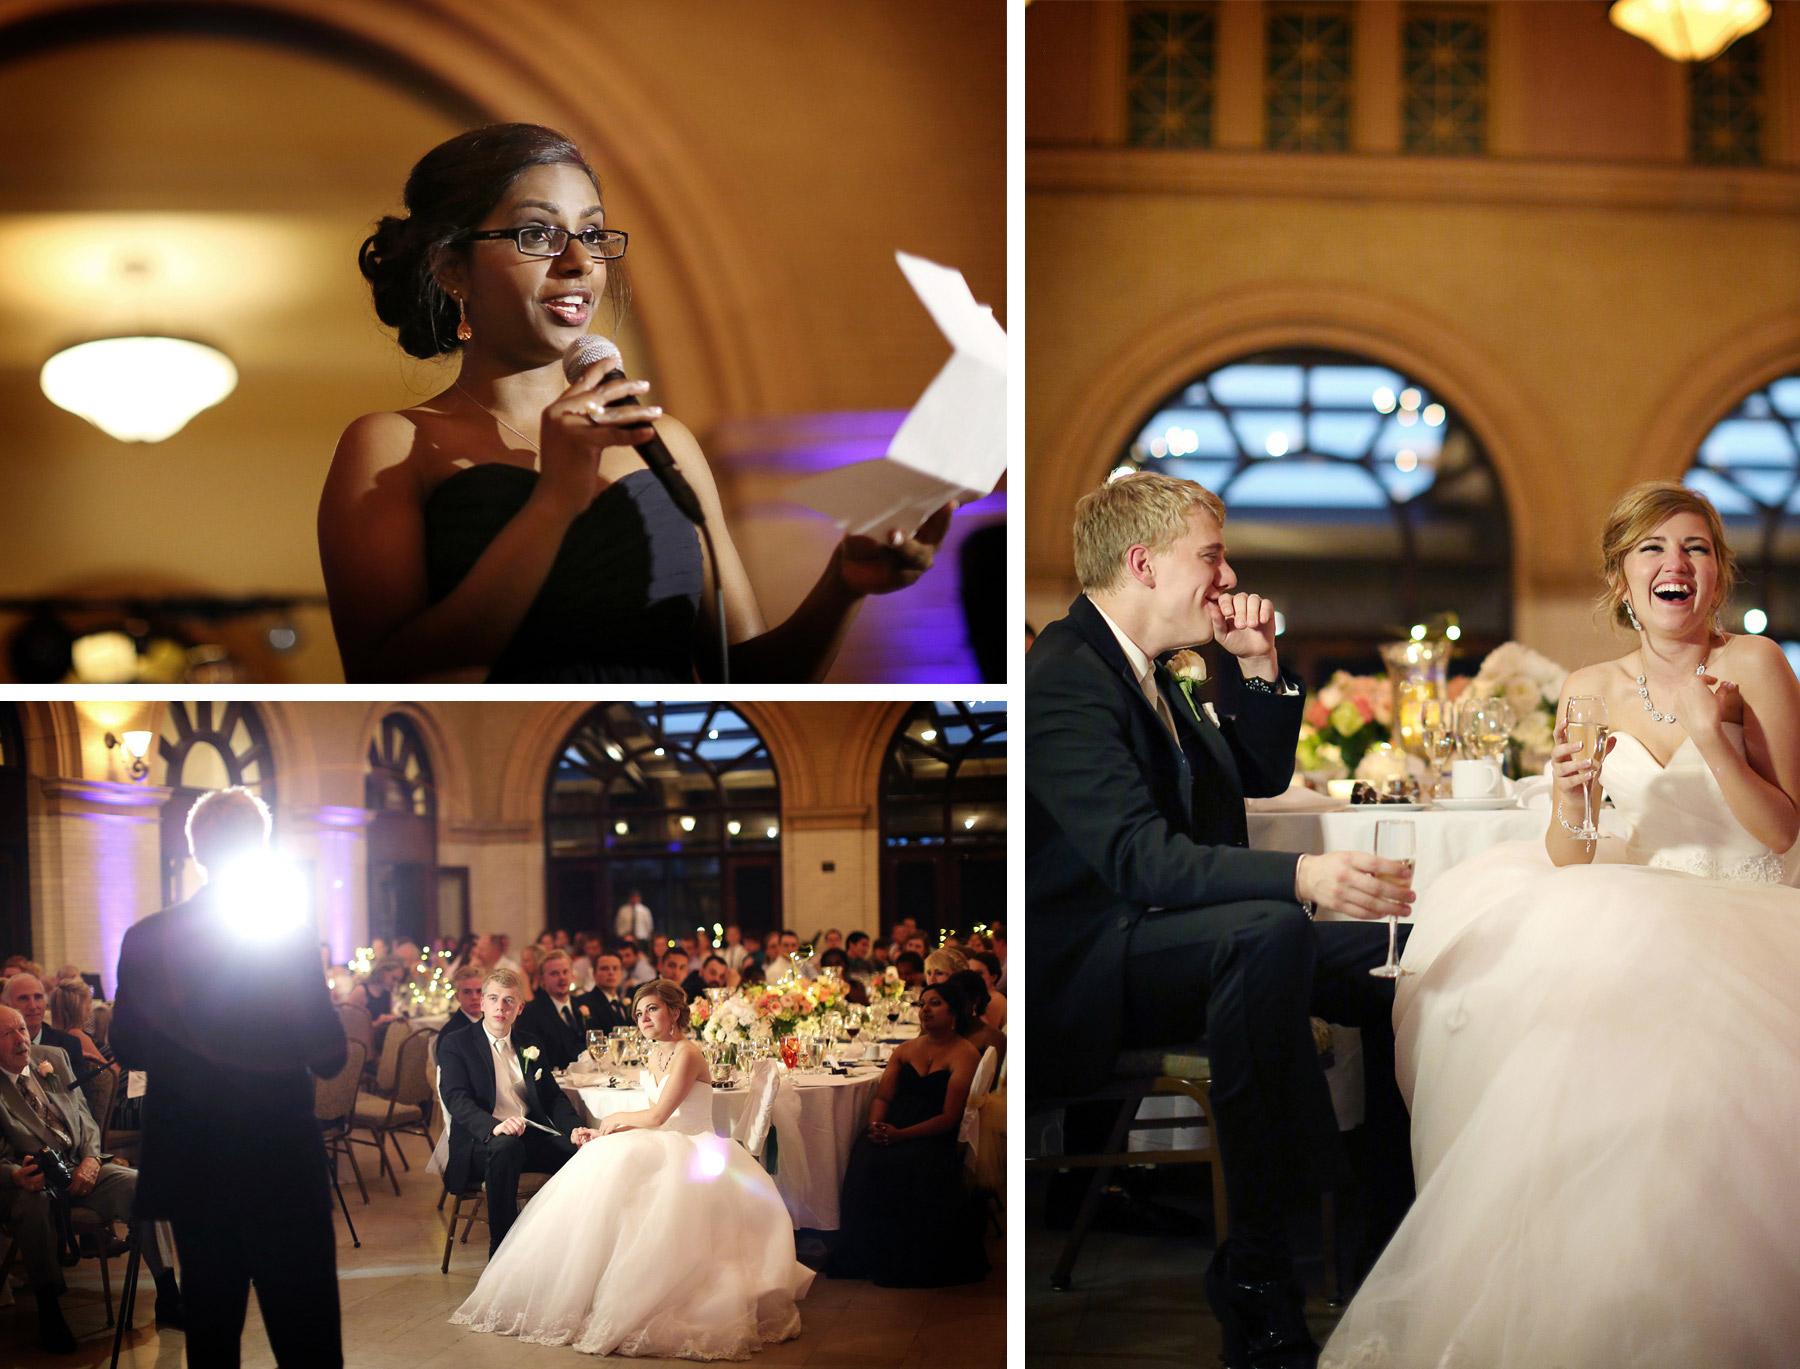 11-Minneapolis-Minnesota-Wedding-Photography-by-Vick-Photography-The-Depot-Reception-Courtney-&-John.jpg